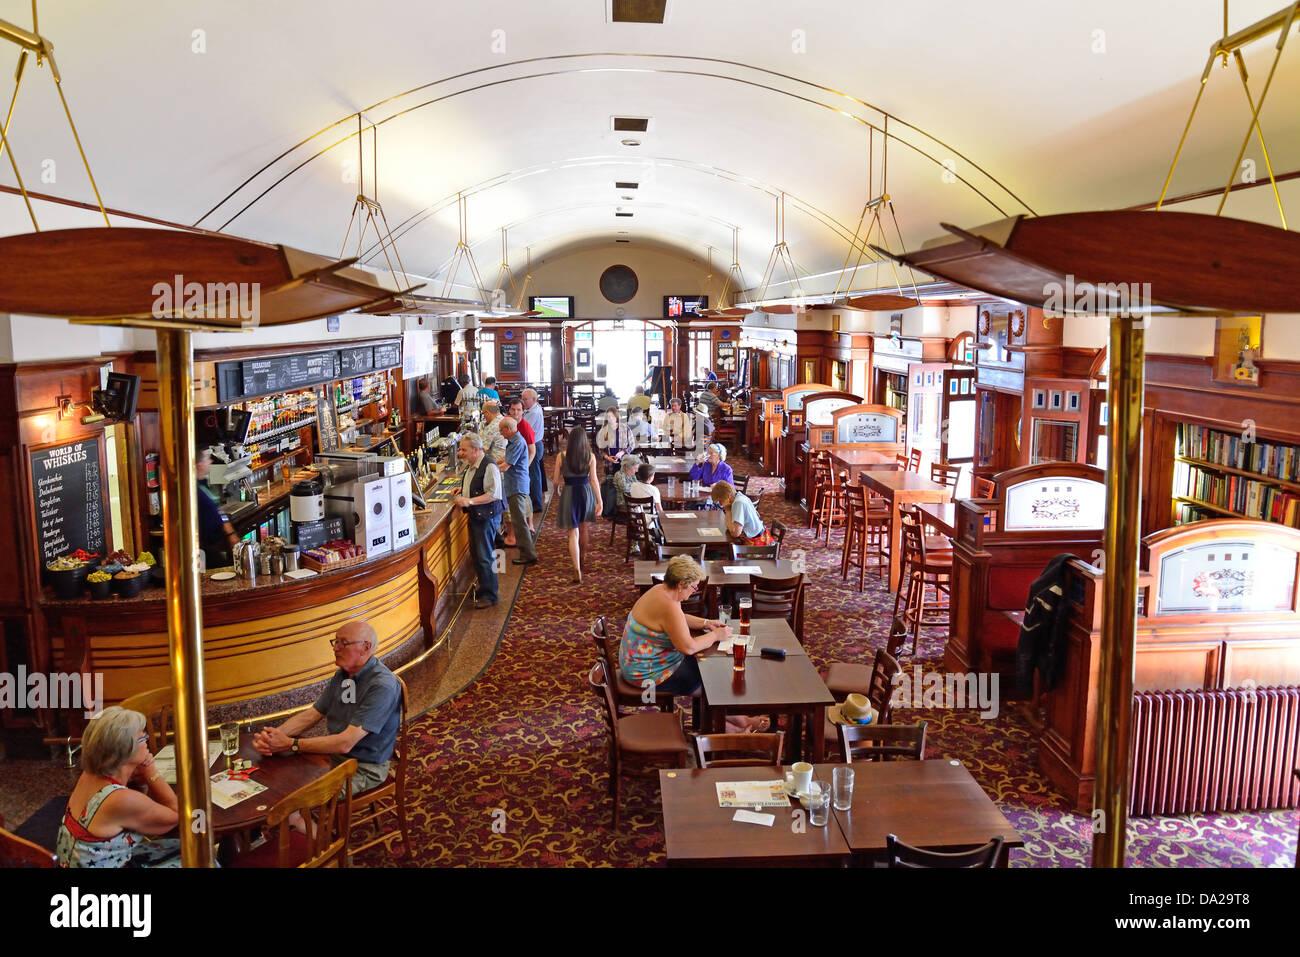 Art Deco interior of The Regent pub (formerly Palace cinema